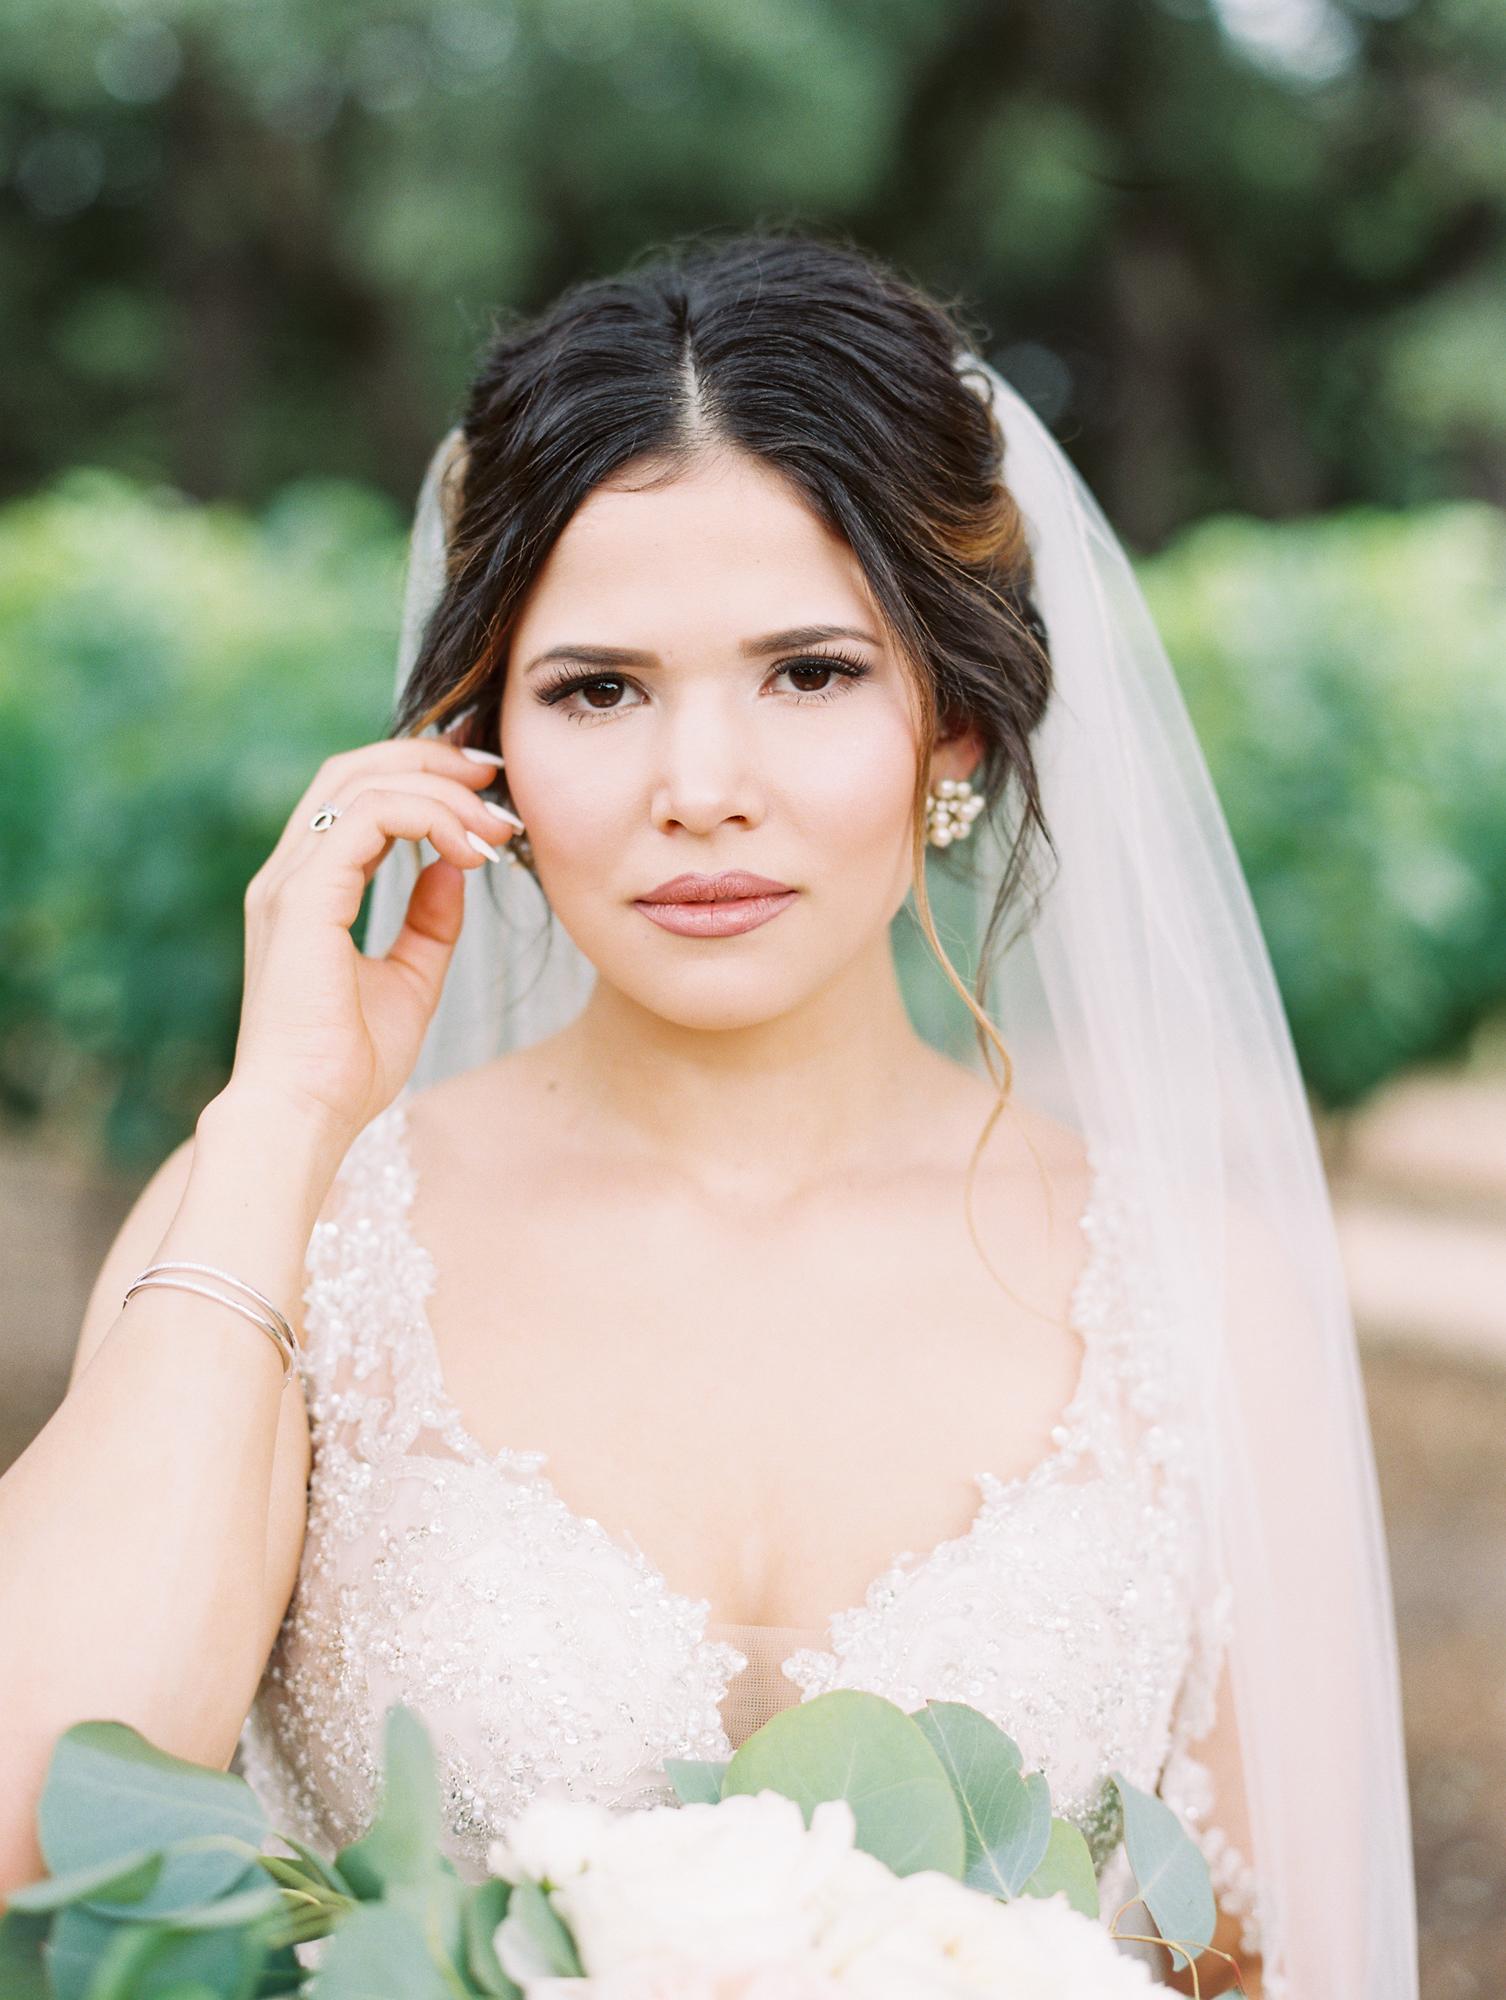 Elegant Spring Vineyard Wedding | Film Wedding Photographer | Austin Wedding Photographer | Classic Bridal Beauty | Britni Dean Photography // britnidean.com